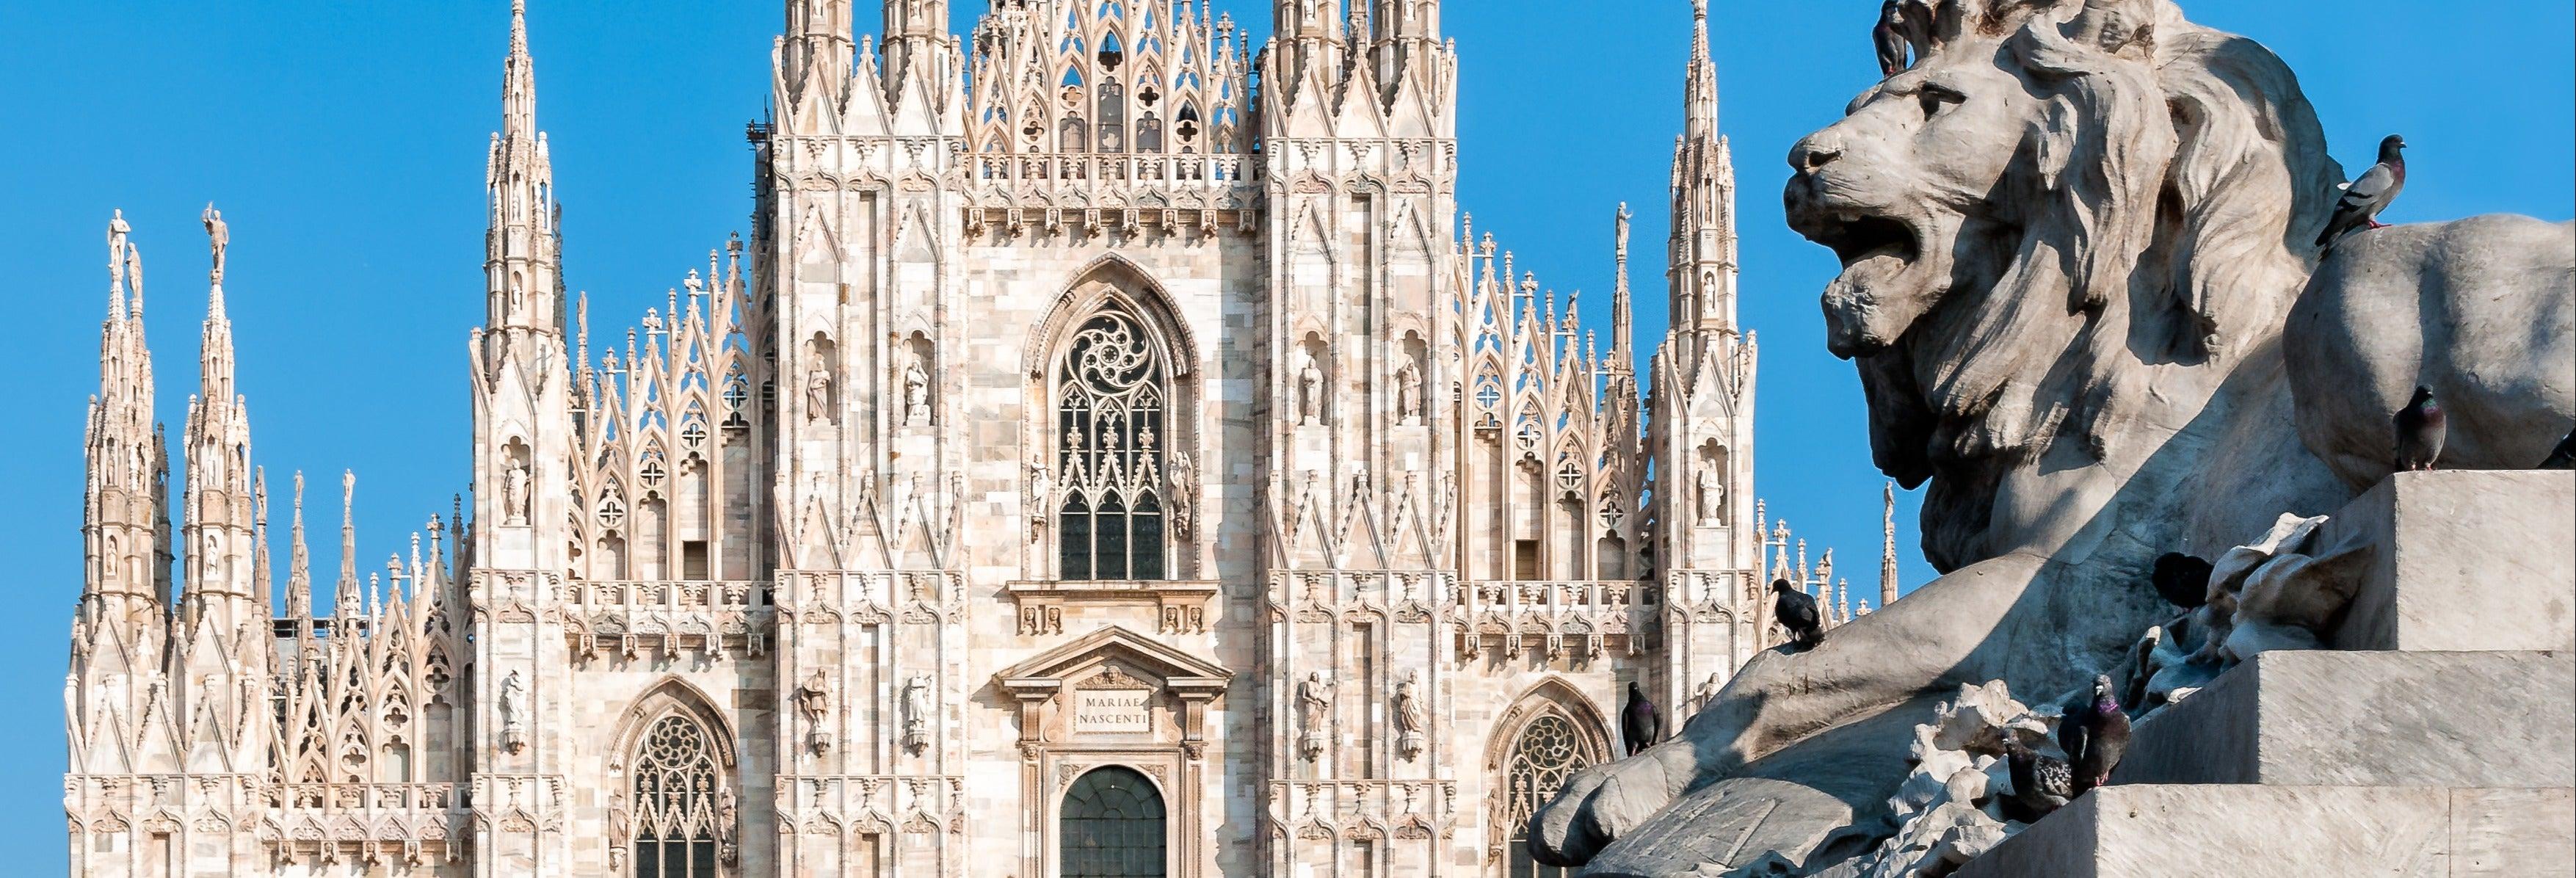 Tour de los fantasmas de Milán